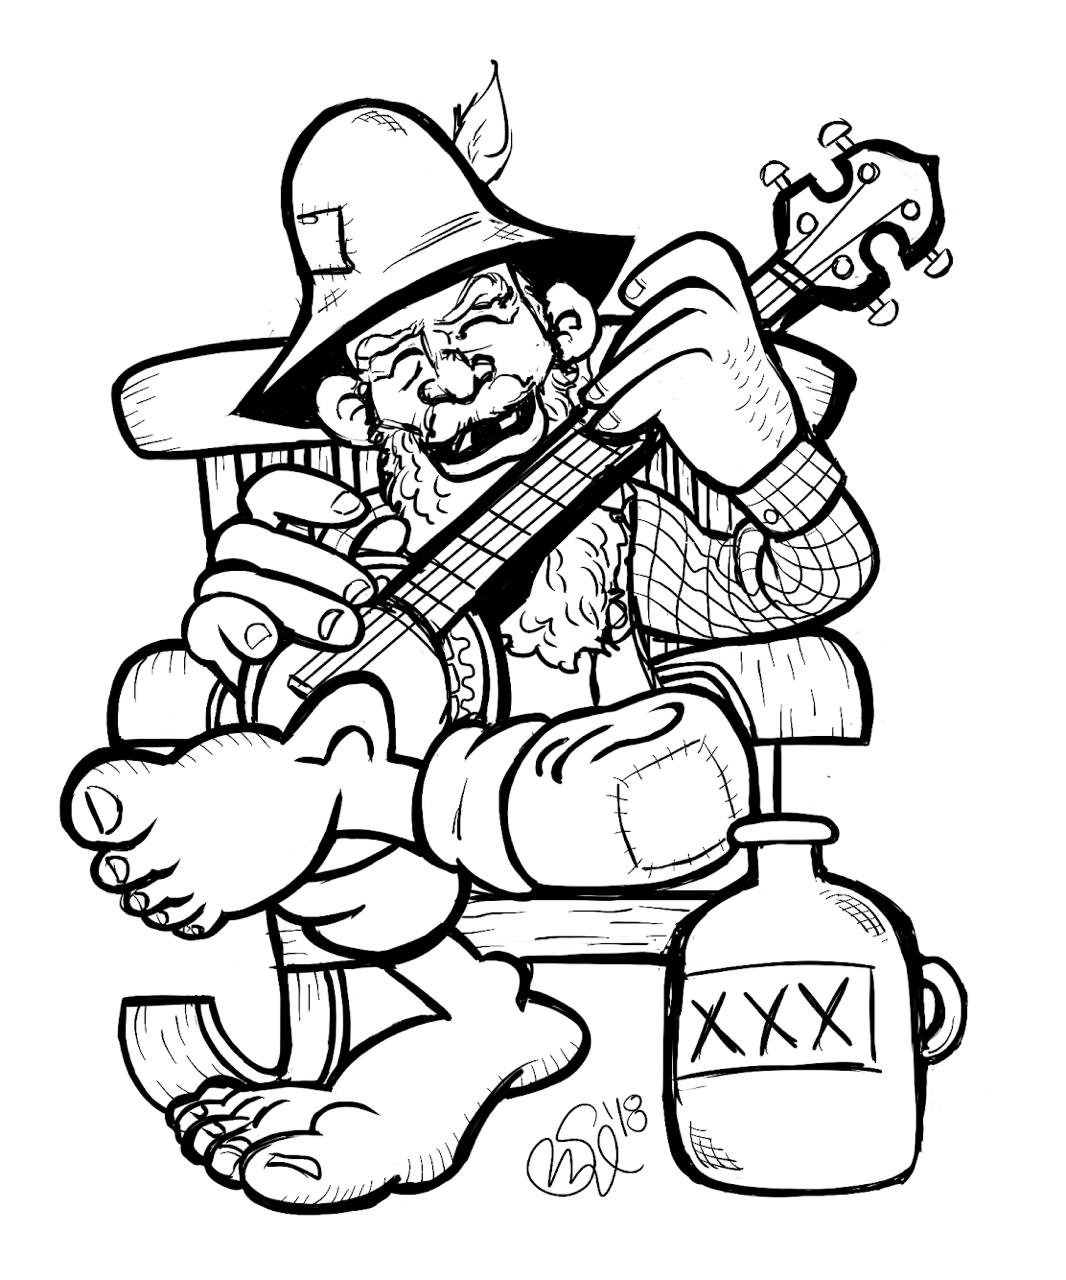 Happy Hillbilly By Ben Sanczel Cartoonist Hillbilly Banjo Art Bw Drawing Ipad Drawings Guitar Wall Art Cartoon Drawings